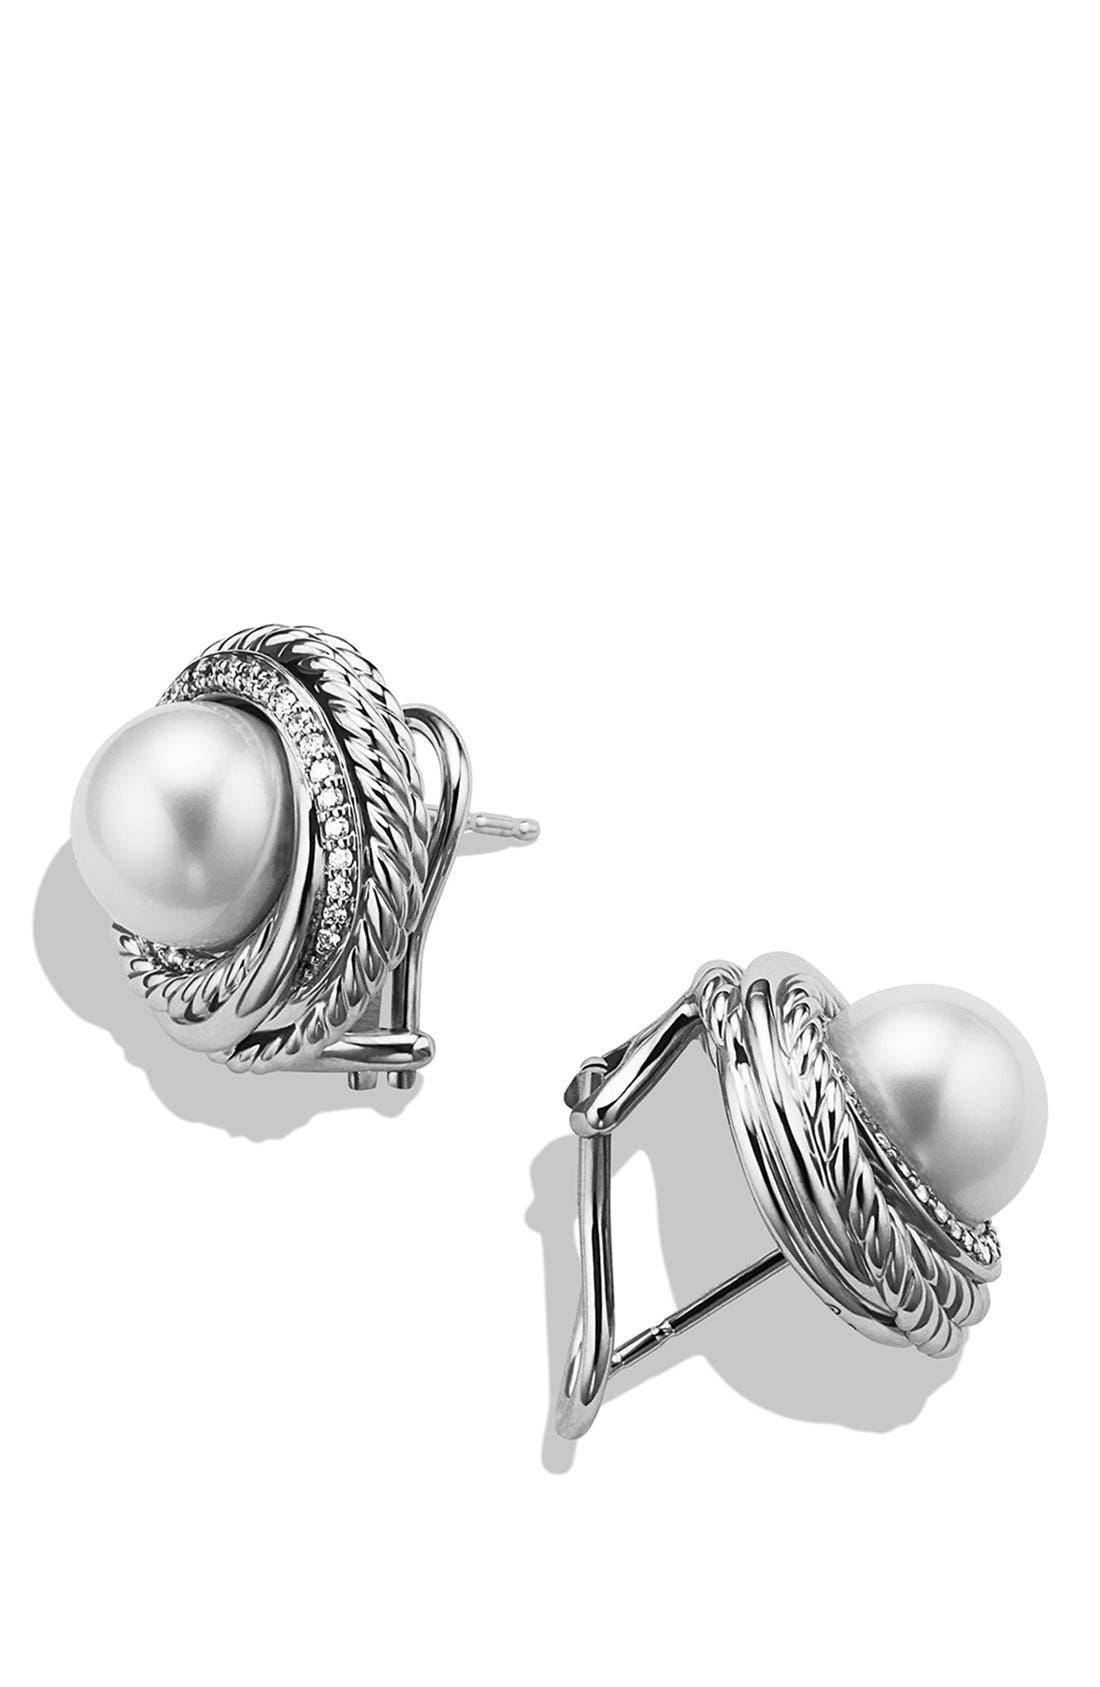 Alternate Image 2  - David Yurman 'Pearl Crossover' Earrings with Diamonds